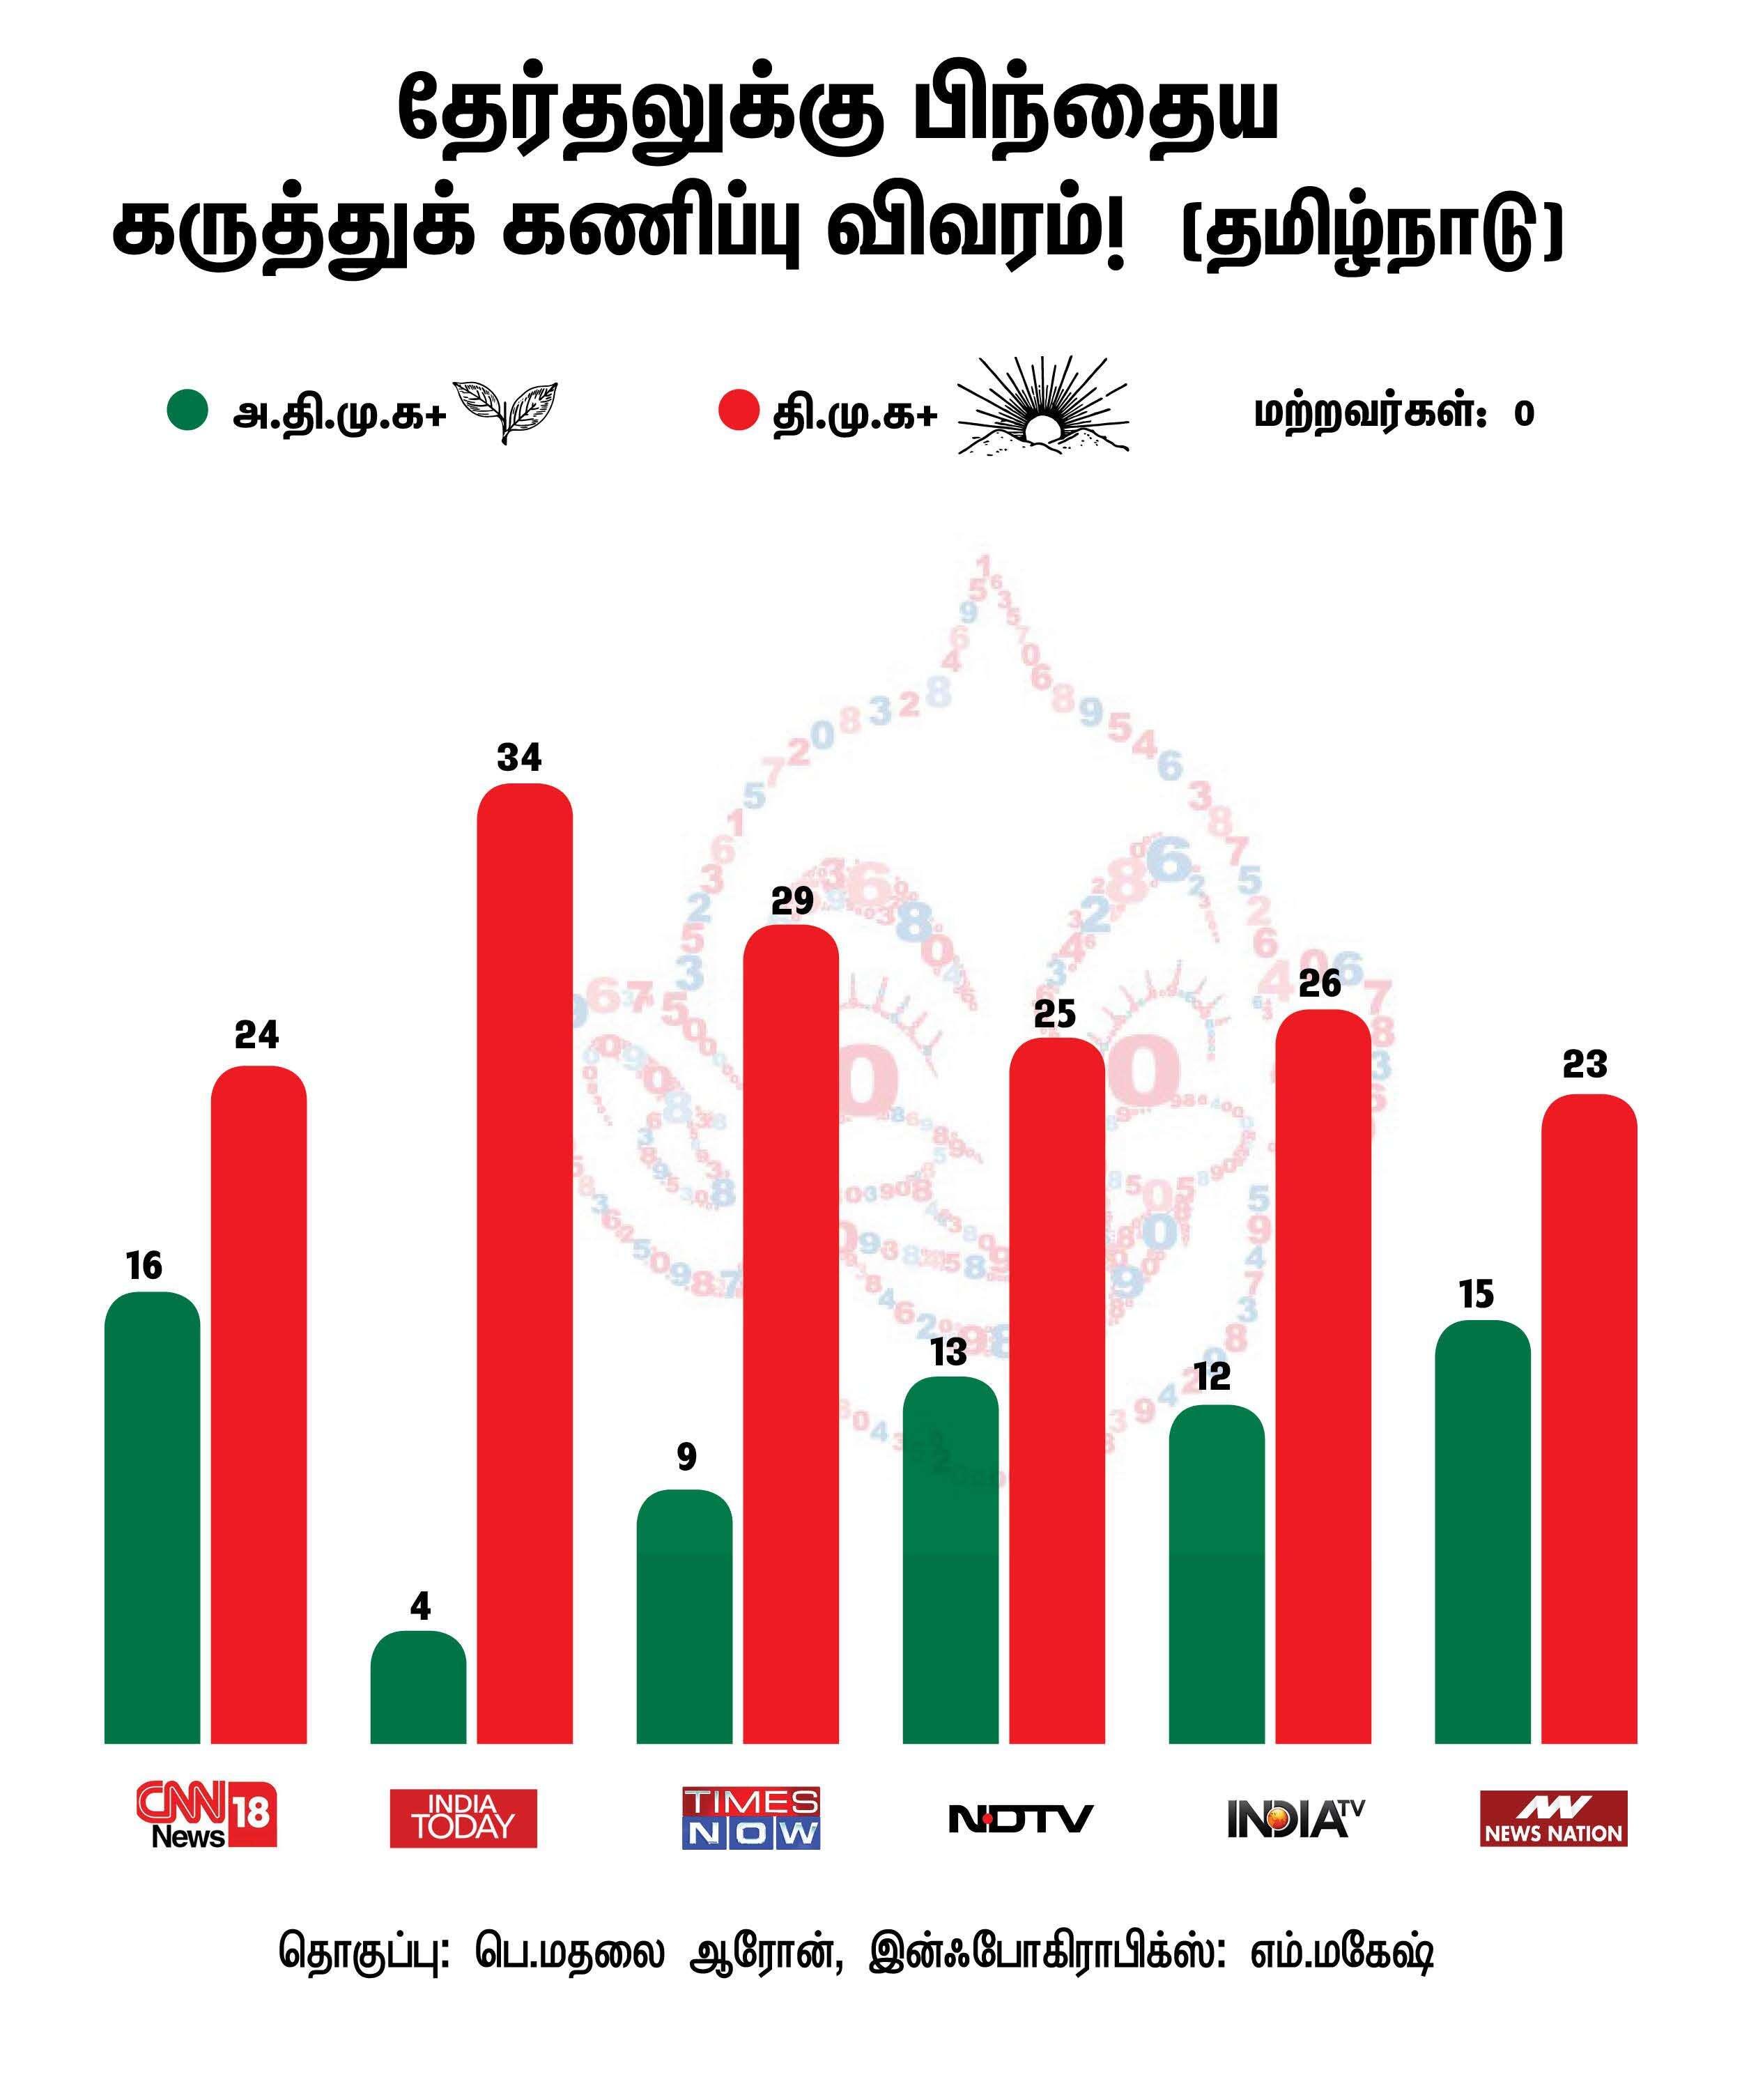 Election_survey___Info_For_Dot_com_Tamilndu_16227  தேர்தலுக்குப் பிந்தைய கருத்துக்கணிப்பு முடிவுகளும் கூட்டணி ஆட்சியும்.. Election survey   Info For Dot com Tamilndu 16227